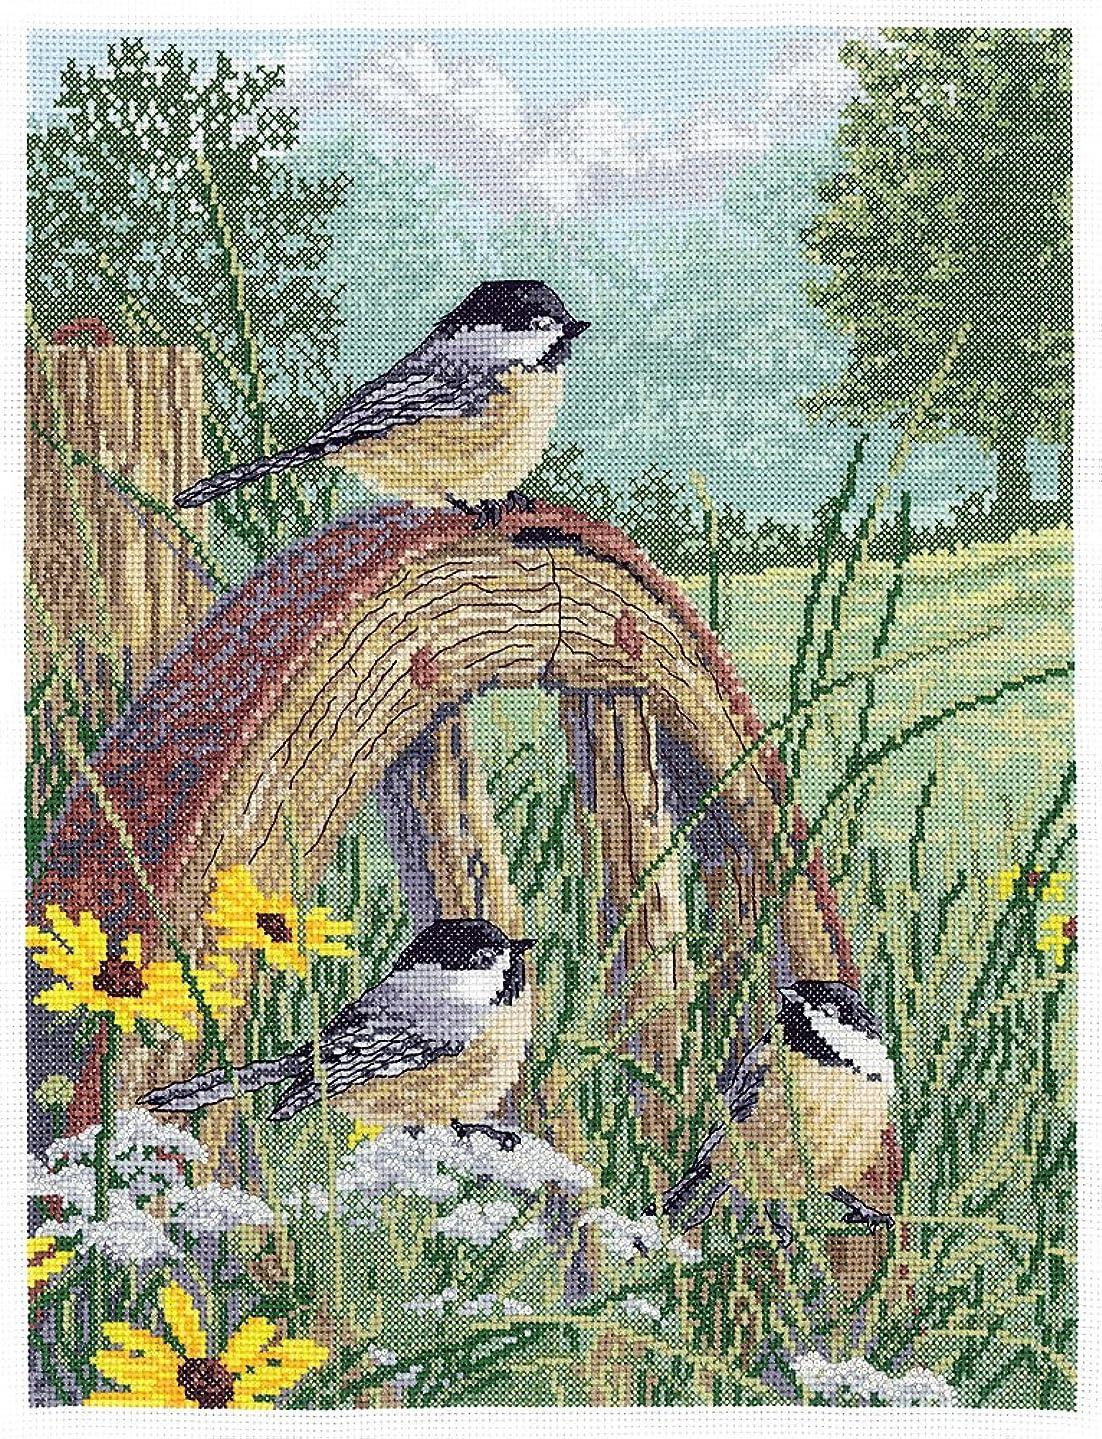 Janlynn 008-0203 Meadow's Edge Counted Cross Stitch Kit, 11 x 14